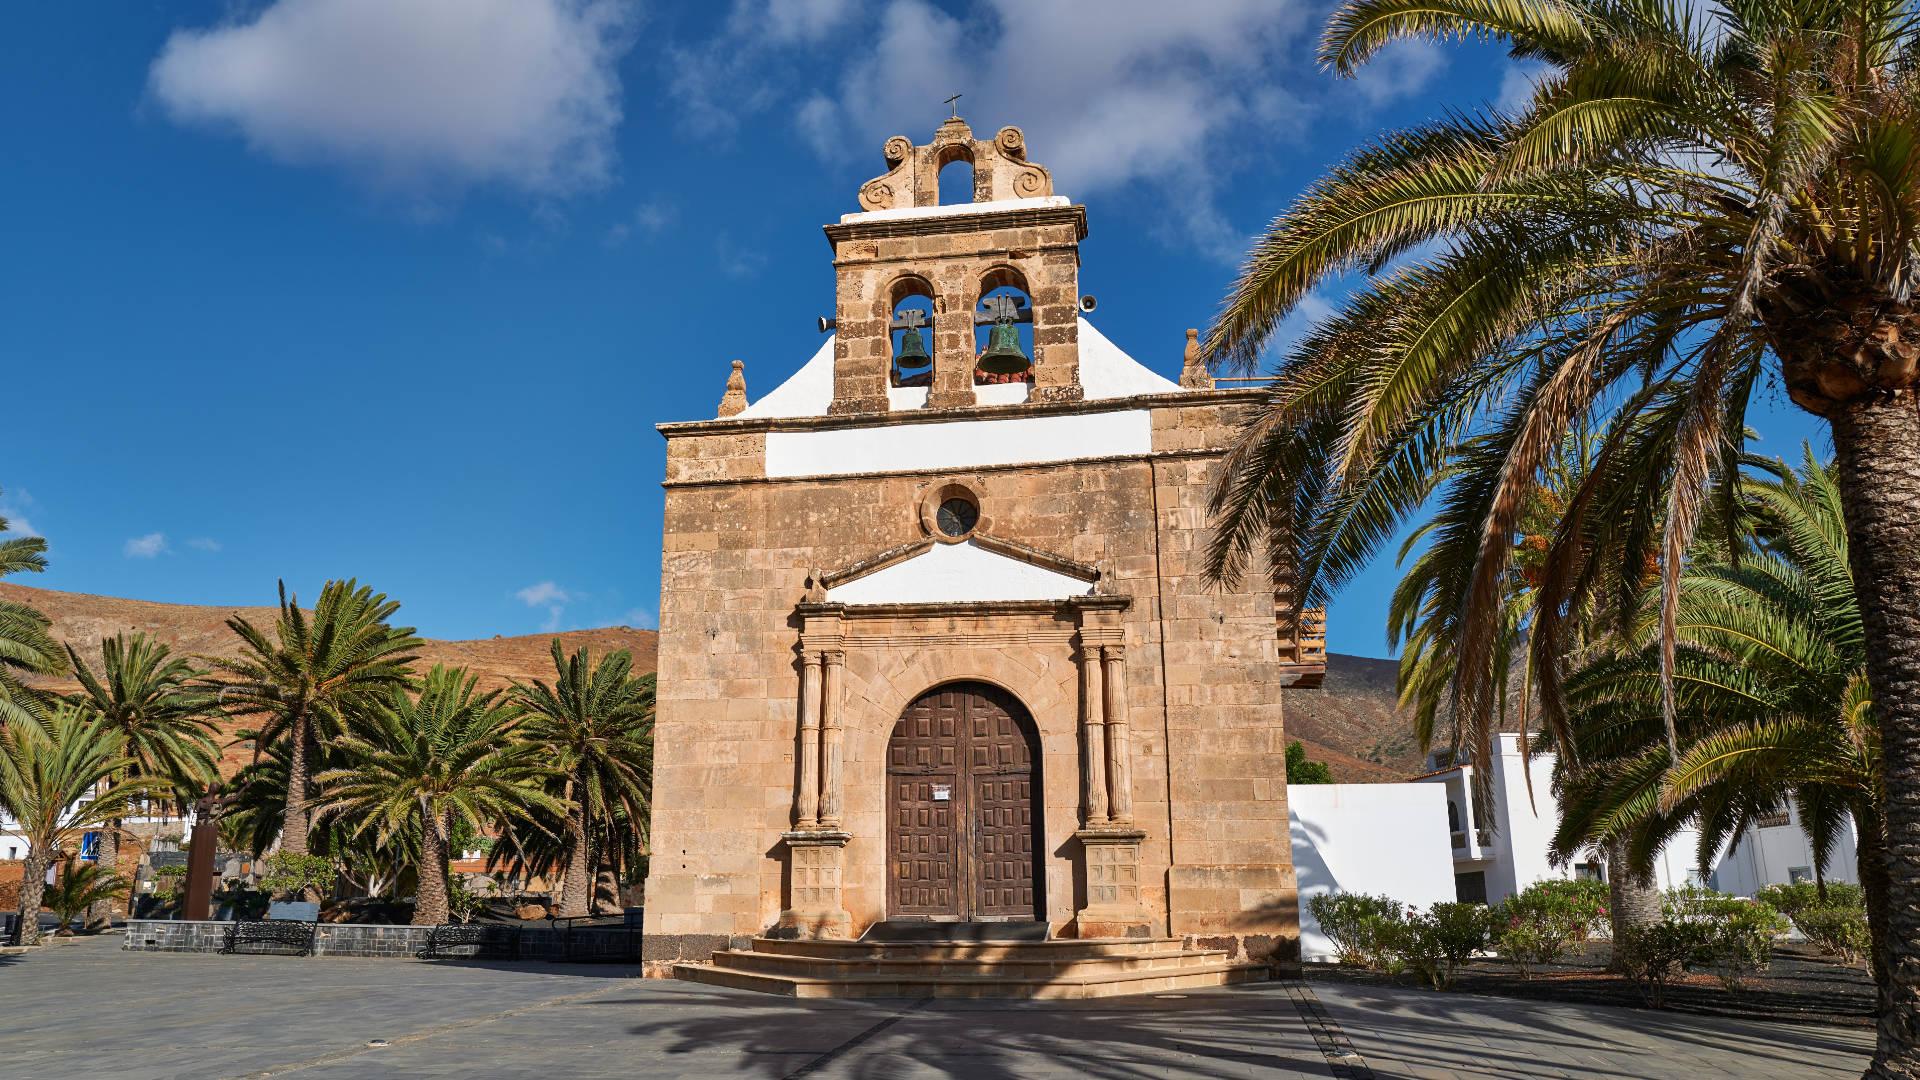 Iglesia de la Virgen de la Peña in Vega de Río Palmas